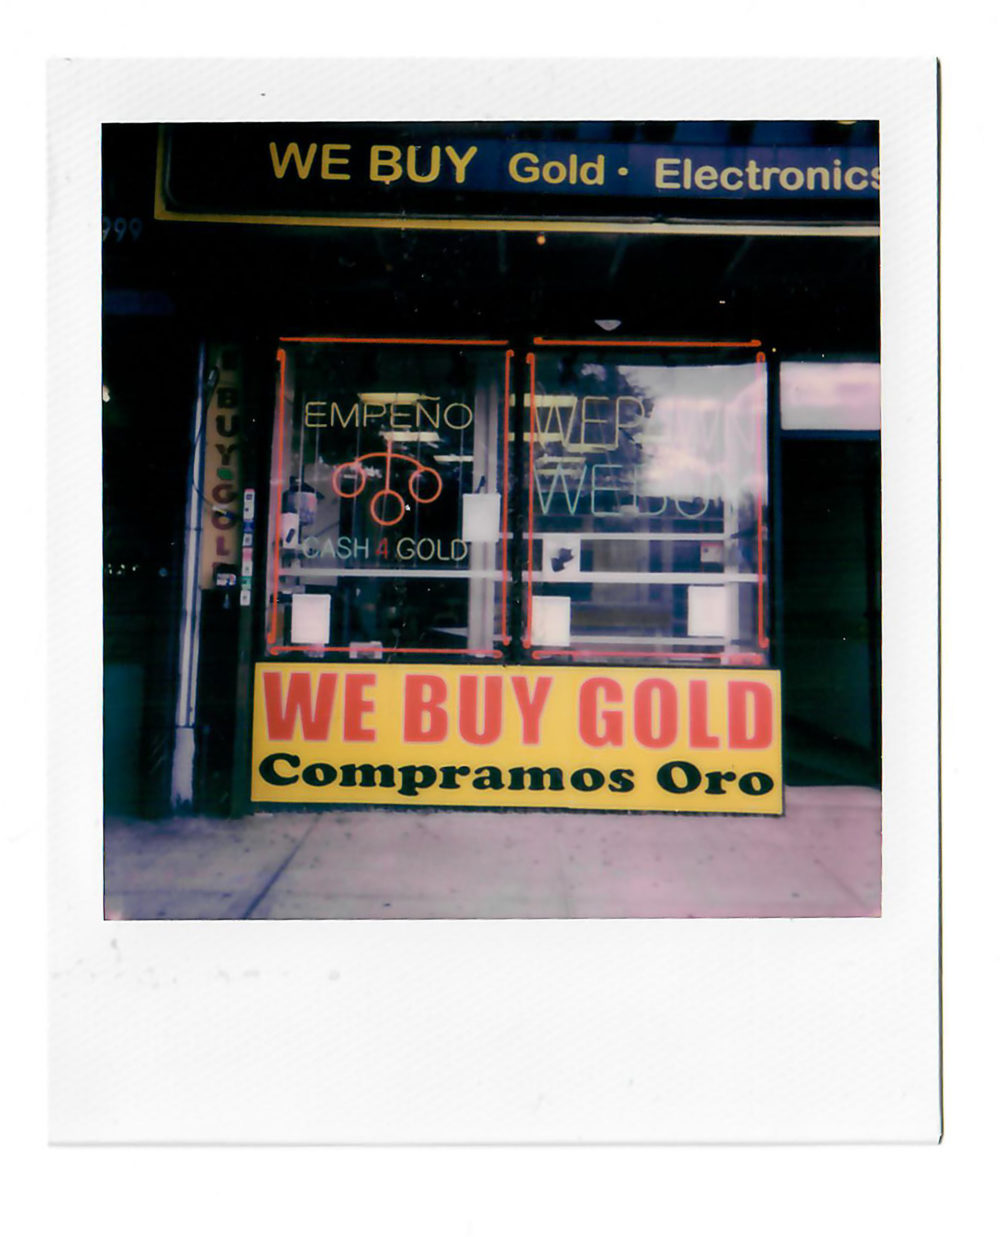 Pawn shop storefront